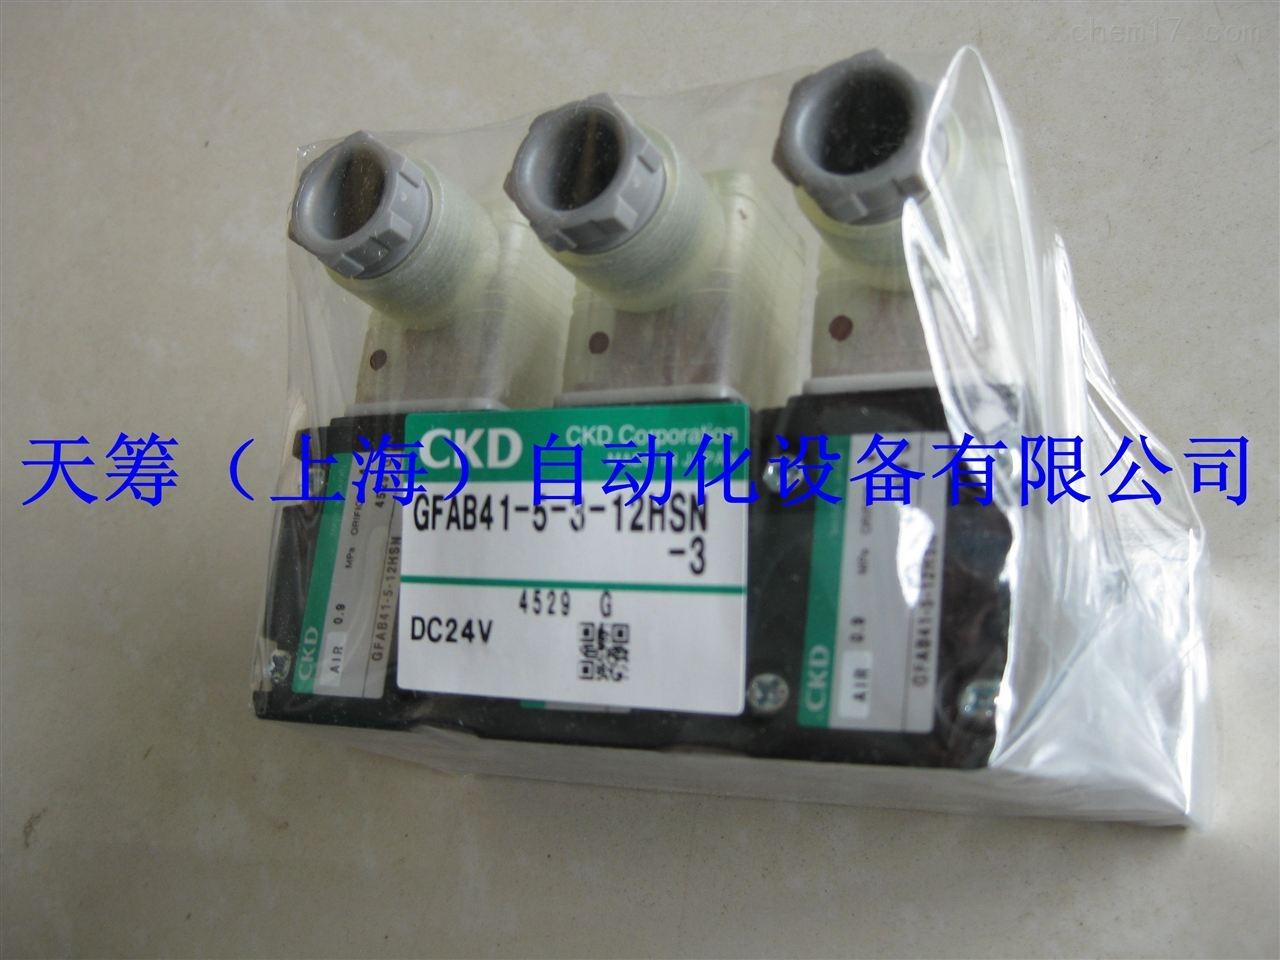 CKD电磁阀GFAB41-5-3-12HSN-3